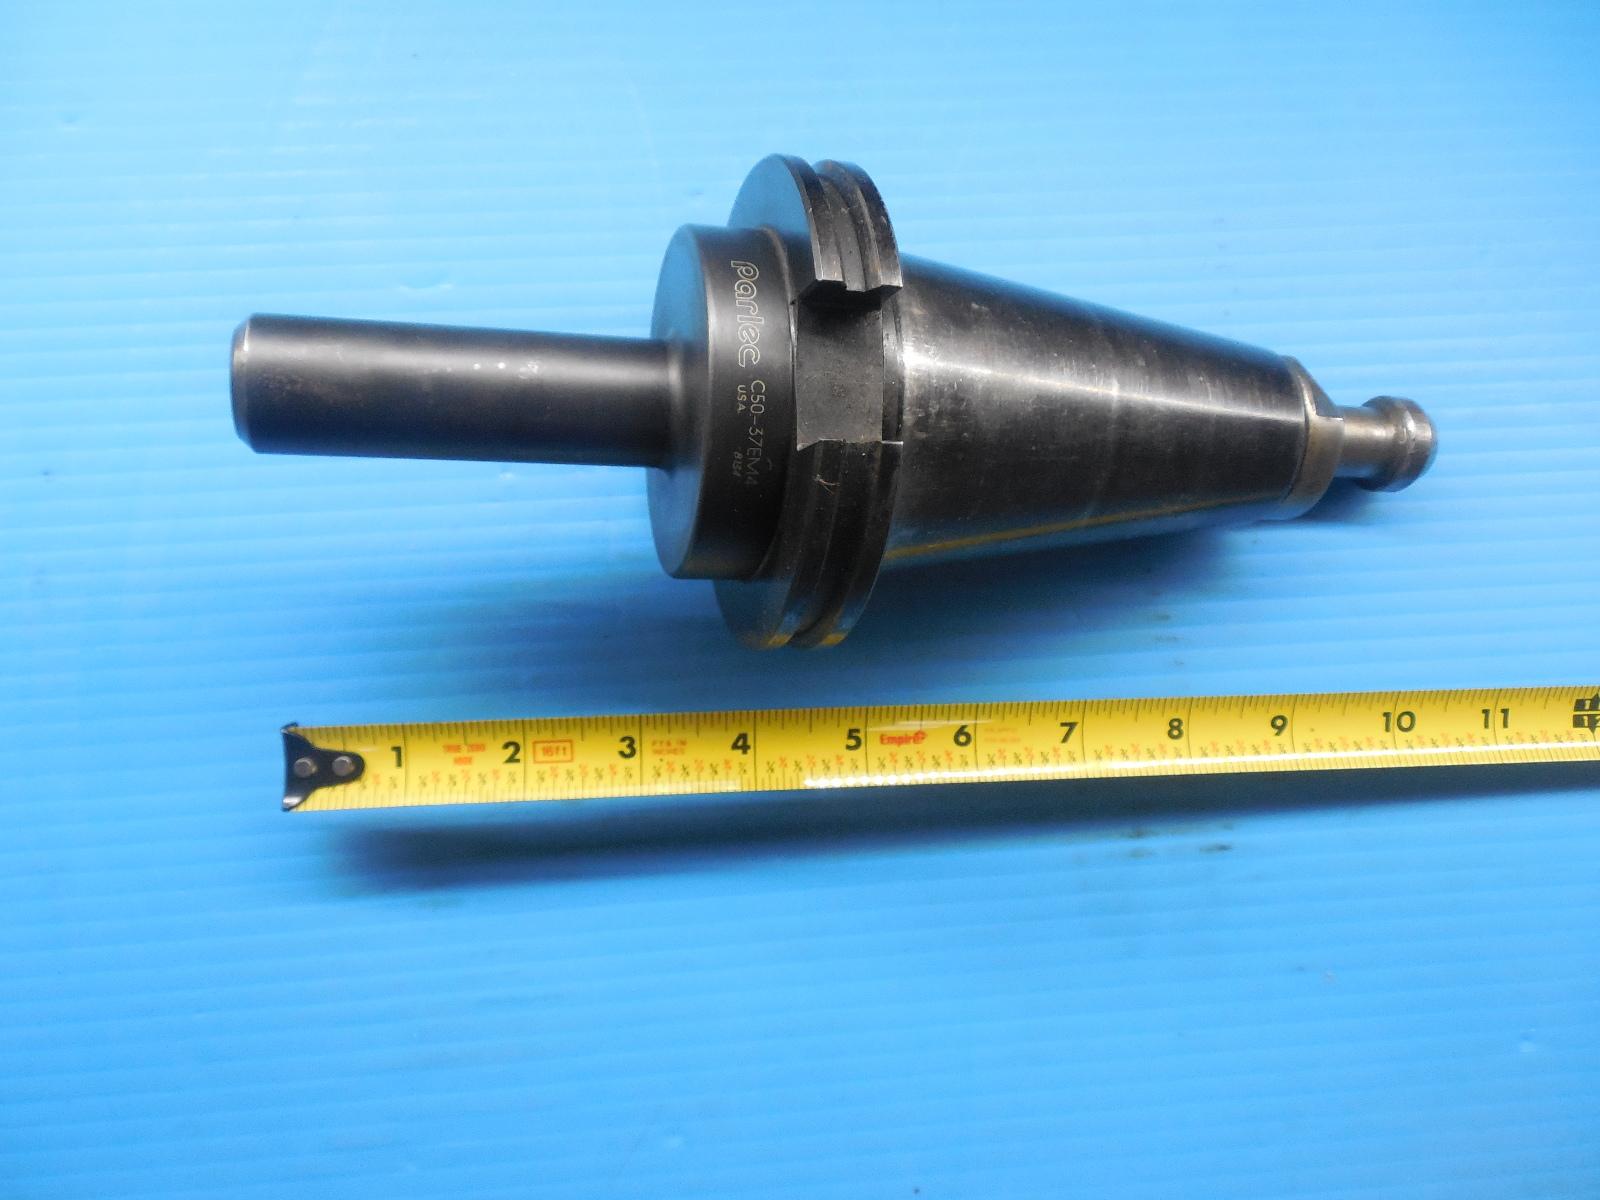 0.050 Projection 0.375 Maximum Bore Depth Solid Carbide Tool 0.250 Shank Diameter 0.250 Minimum Bore Diameter 0.017//0.018 Groove Width Micro 100 FR-017-6 Full Radius Grooving Tool 2.5 Overall Length